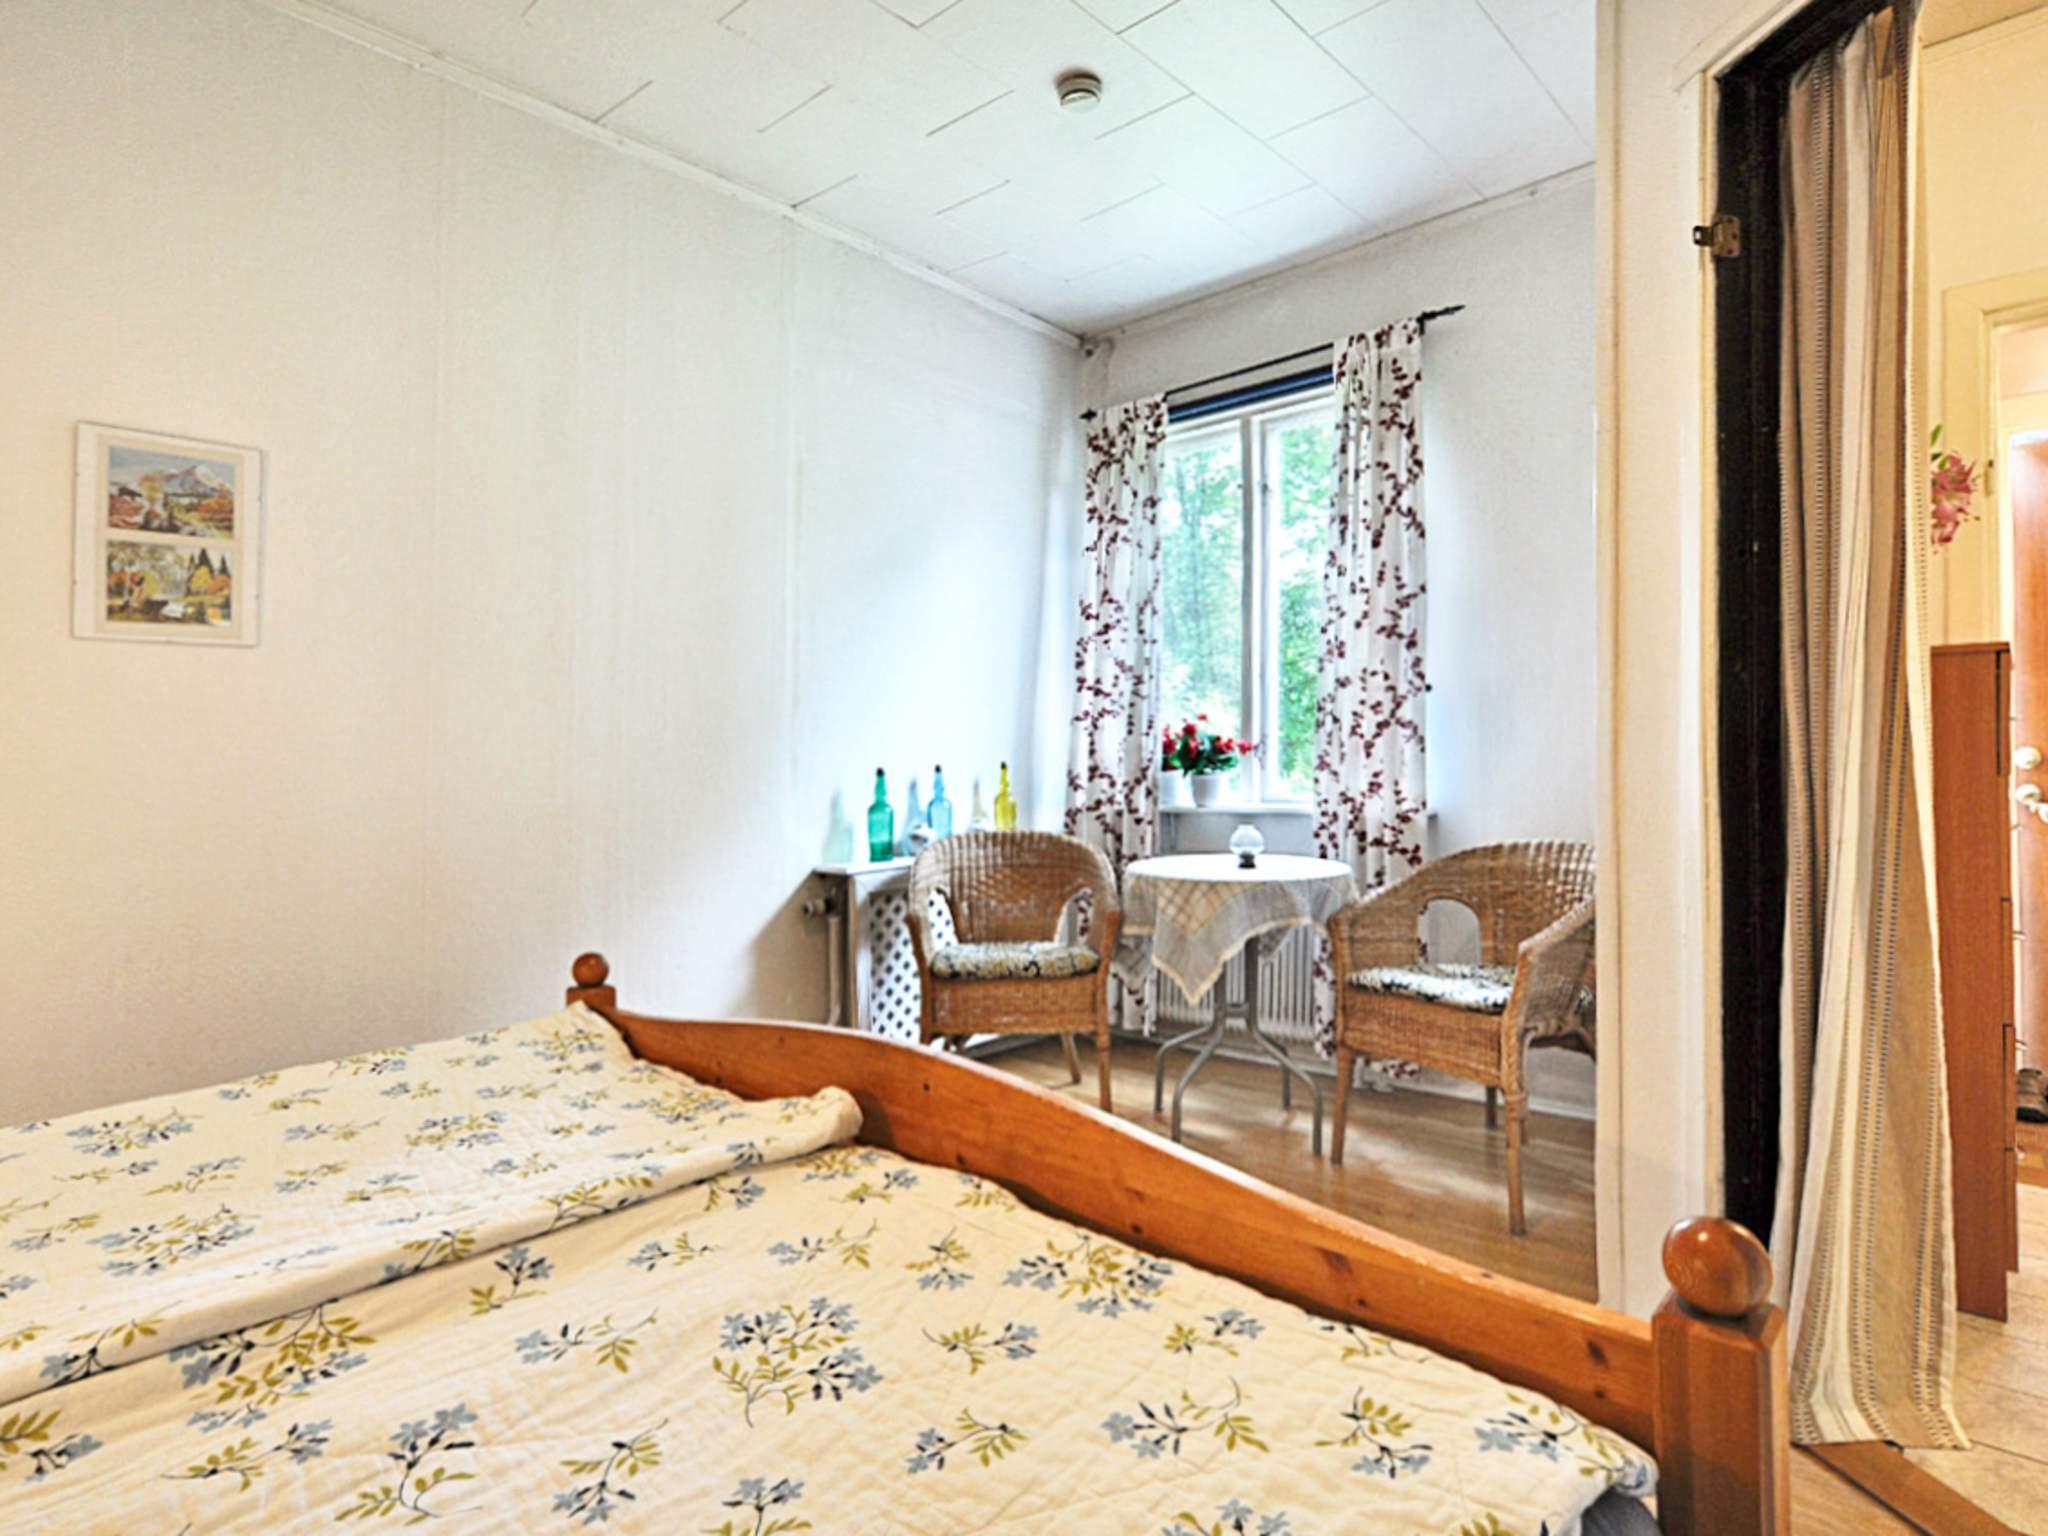 Ferienhaus Finjasjön (86936), Hässleholm, Skane län, Südschweden, Schweden, Bild 7